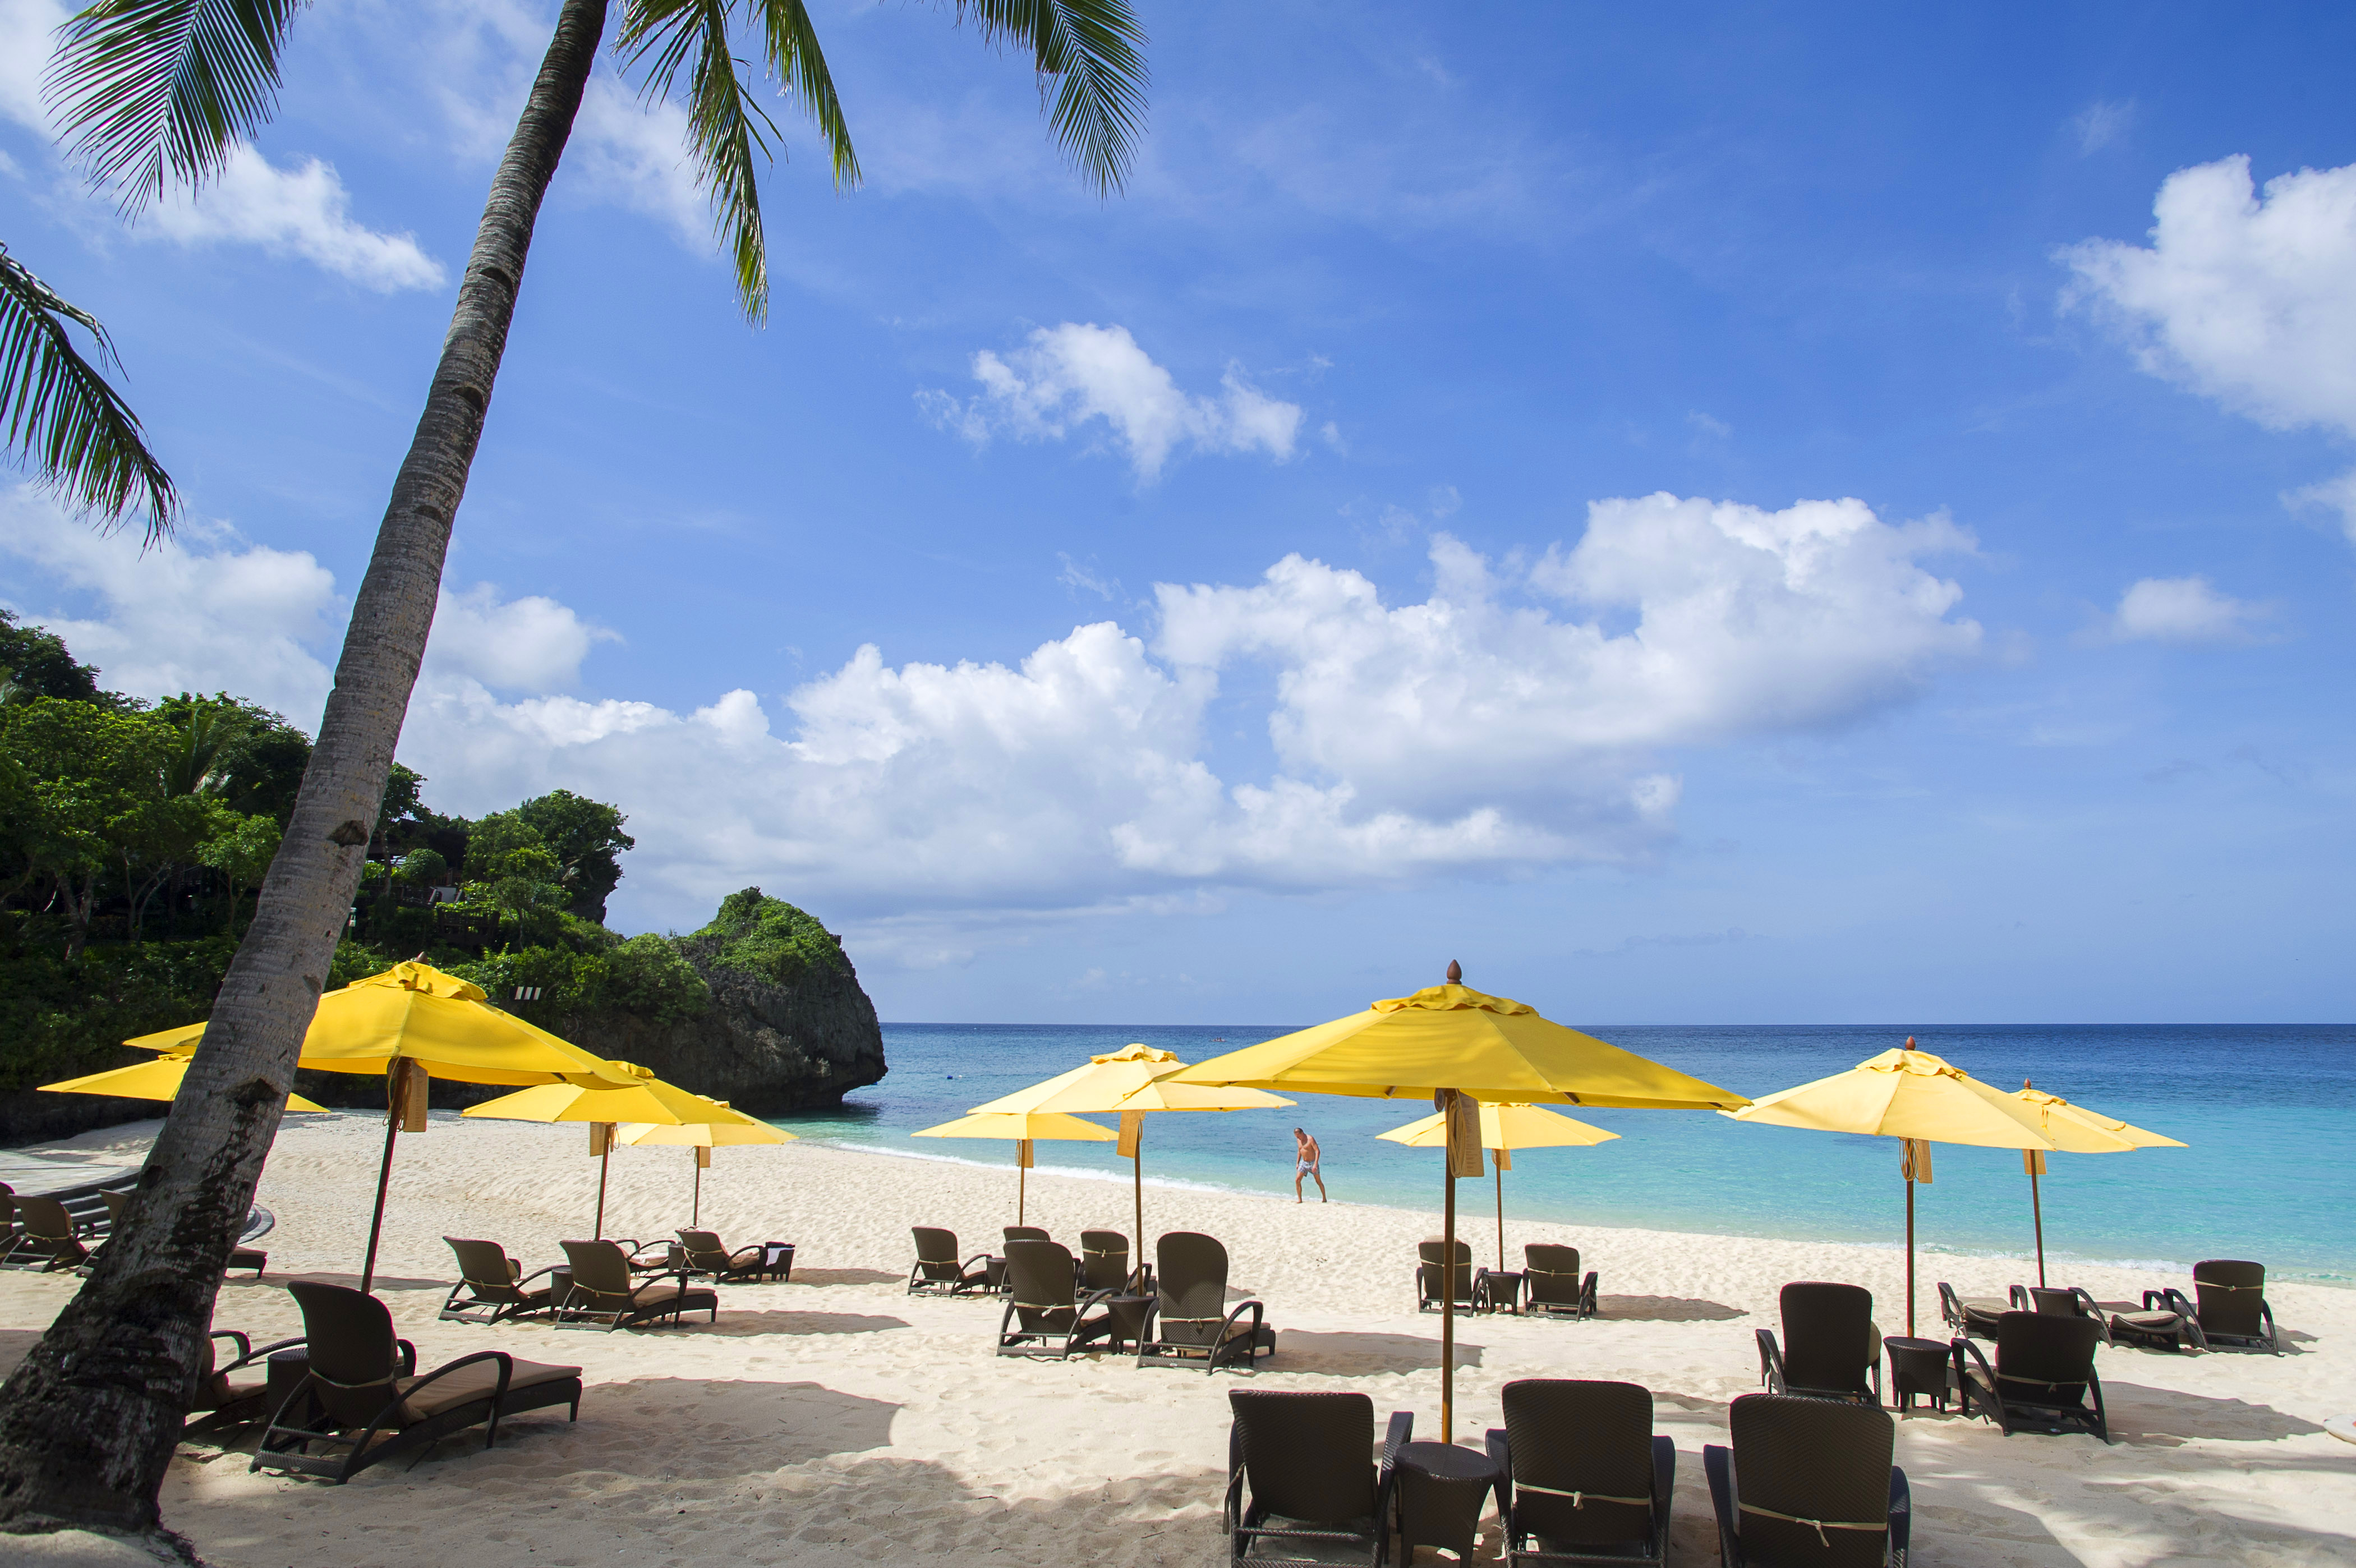 Marvelous Boracay Island Philippines Best Resorts Cnn Travel Forskolin Free Trial Chair Design Images Forskolin Free Trialorg